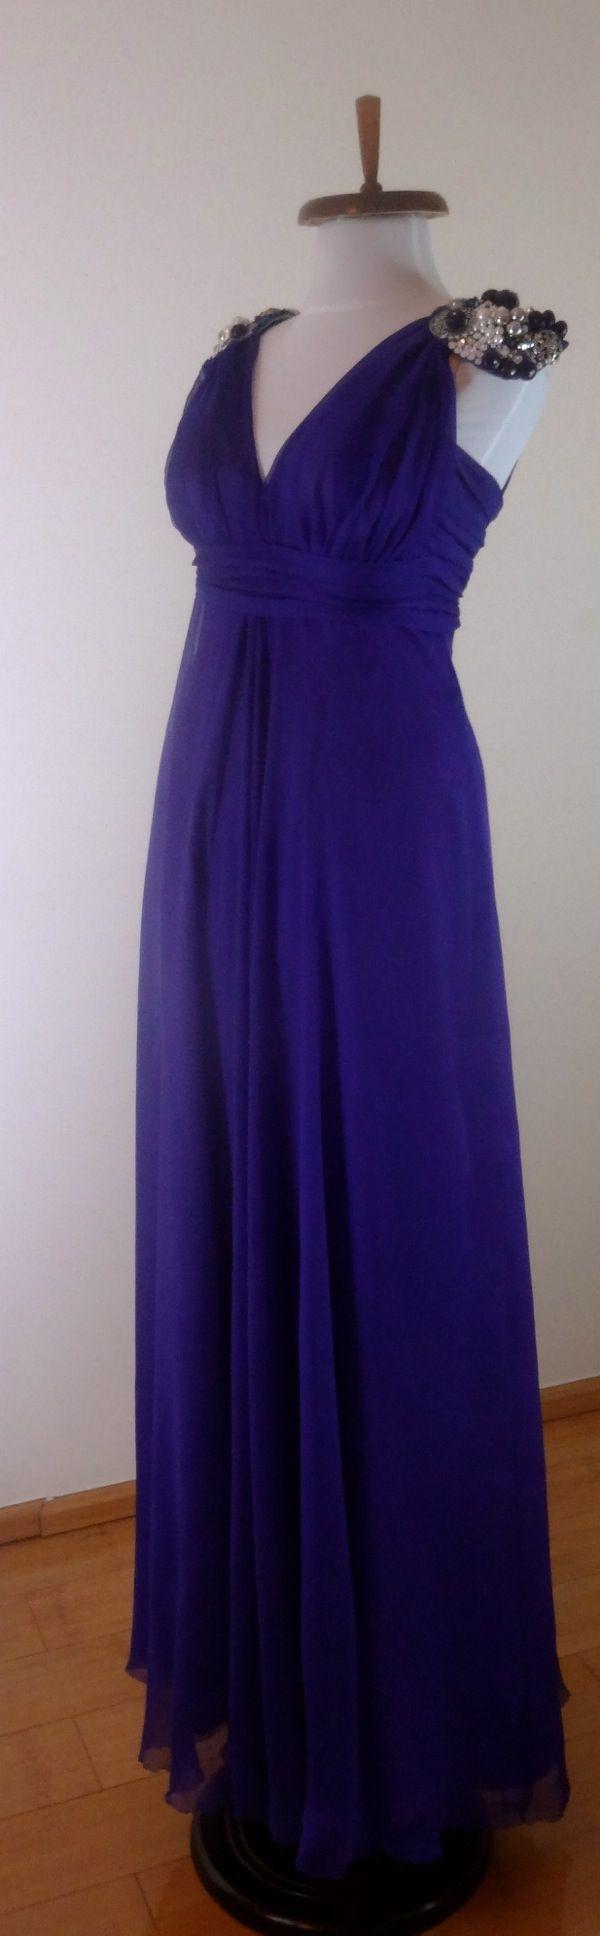 Rochie din voal cu epoleti din margele cusute manual. Model #custommade #Noomi. www.noomi.ro